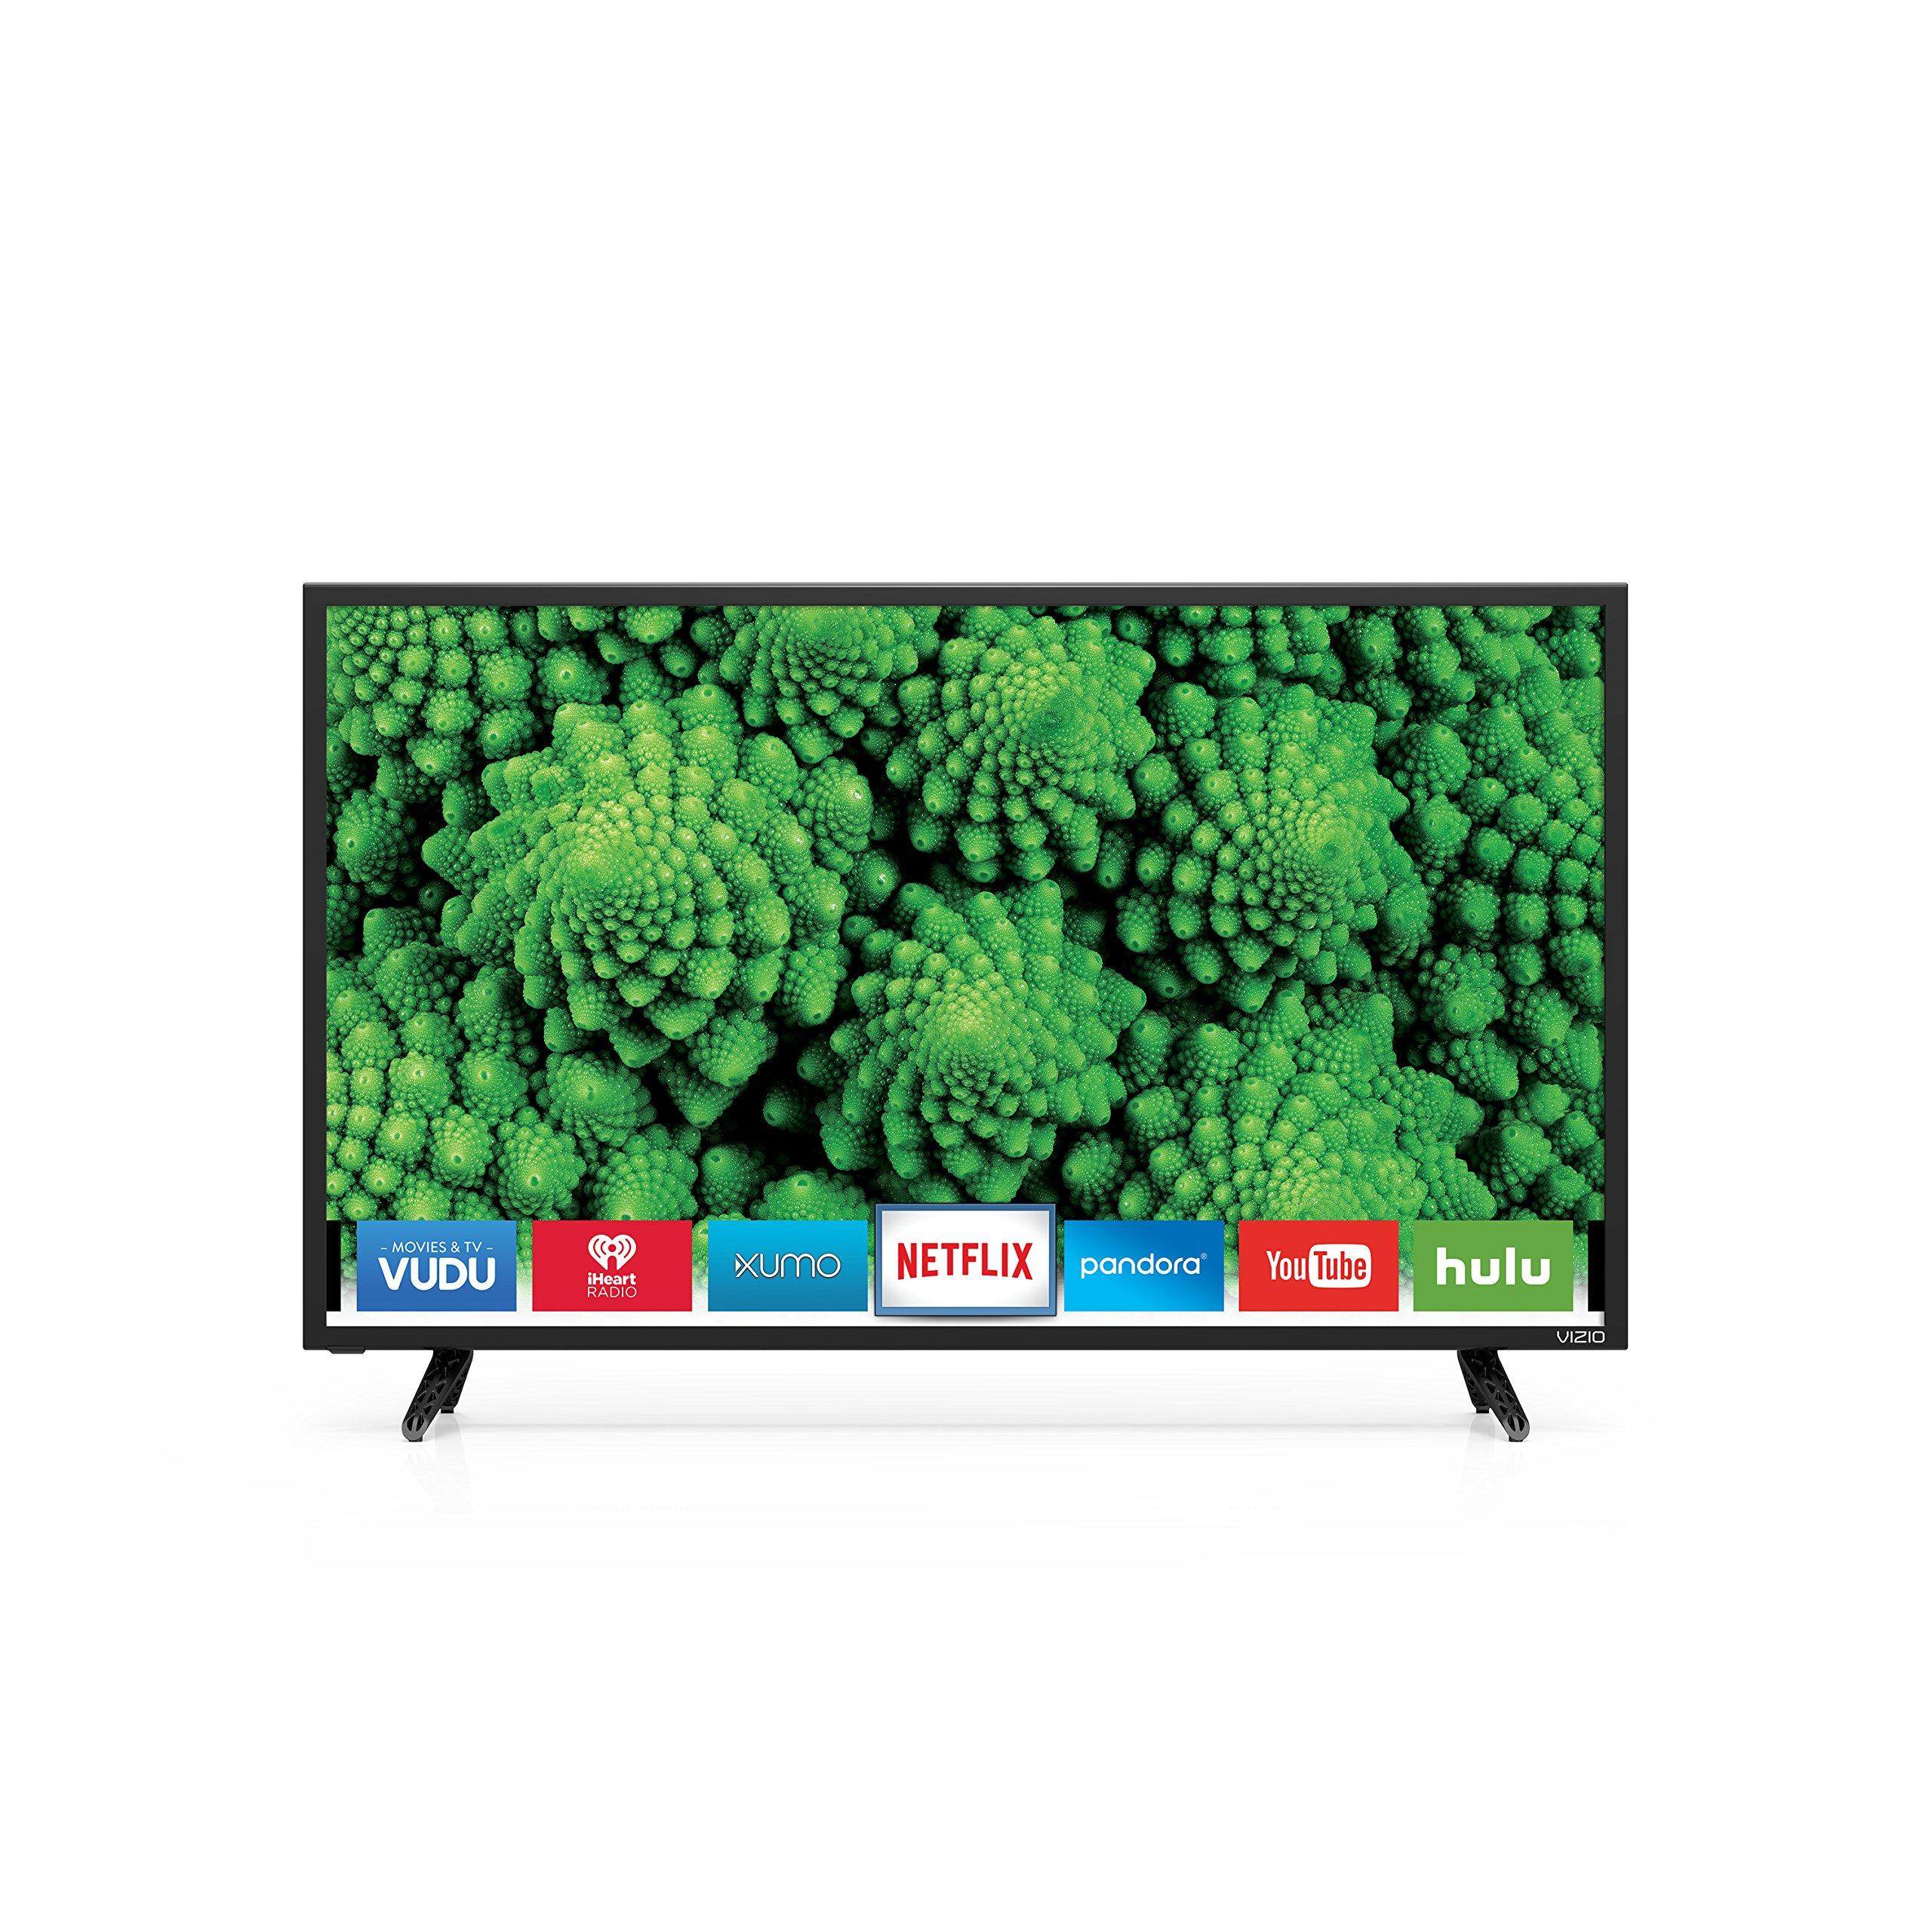 VIZIO D-Series 40'' Class (39.96'' Diag.) LED Smart TV by VIZIO